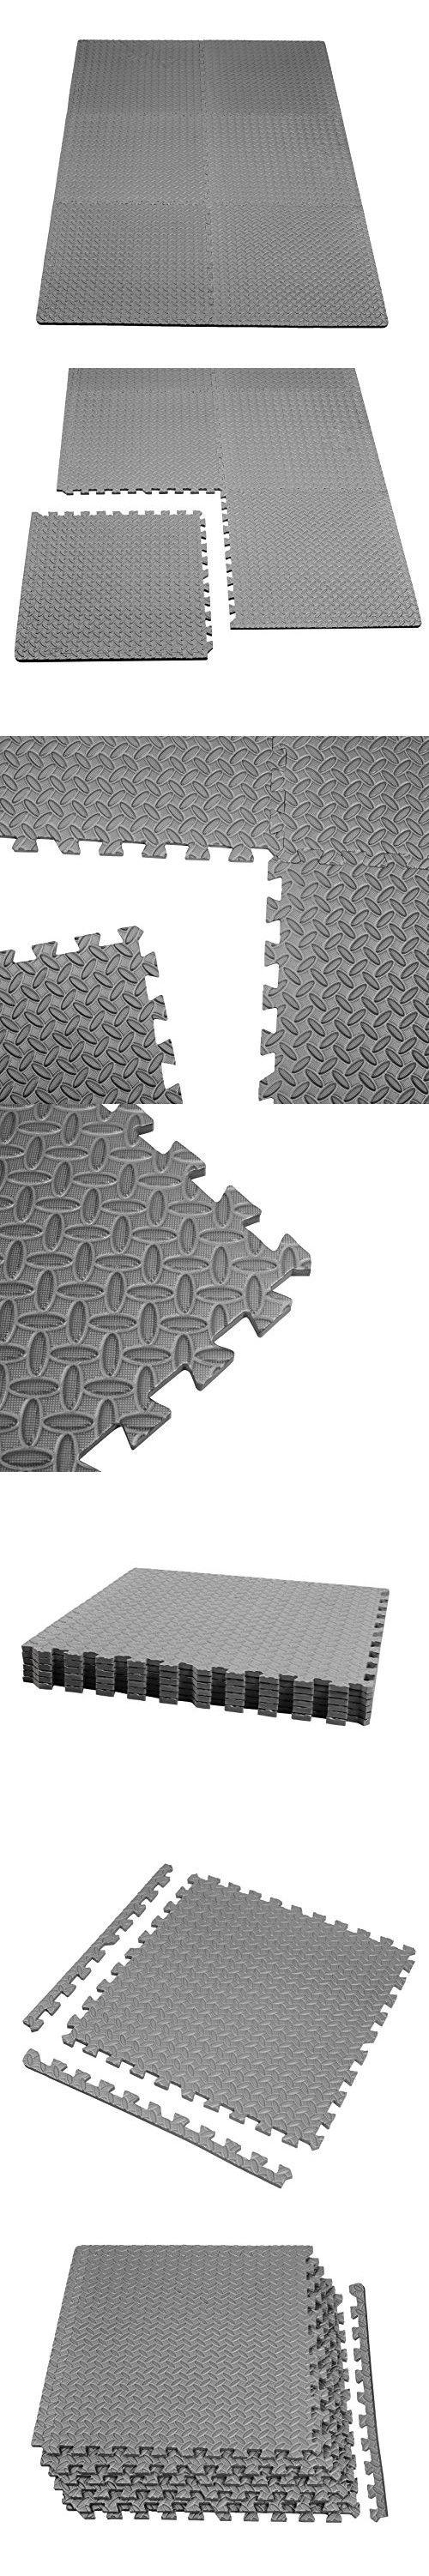 Best 25 interlocking floor tiles ideas on pinterest garage gloue puzzle exercise mat eva interlocking floor mat set for 24 square anti fatigue exercise doublecrazyfo Image collections